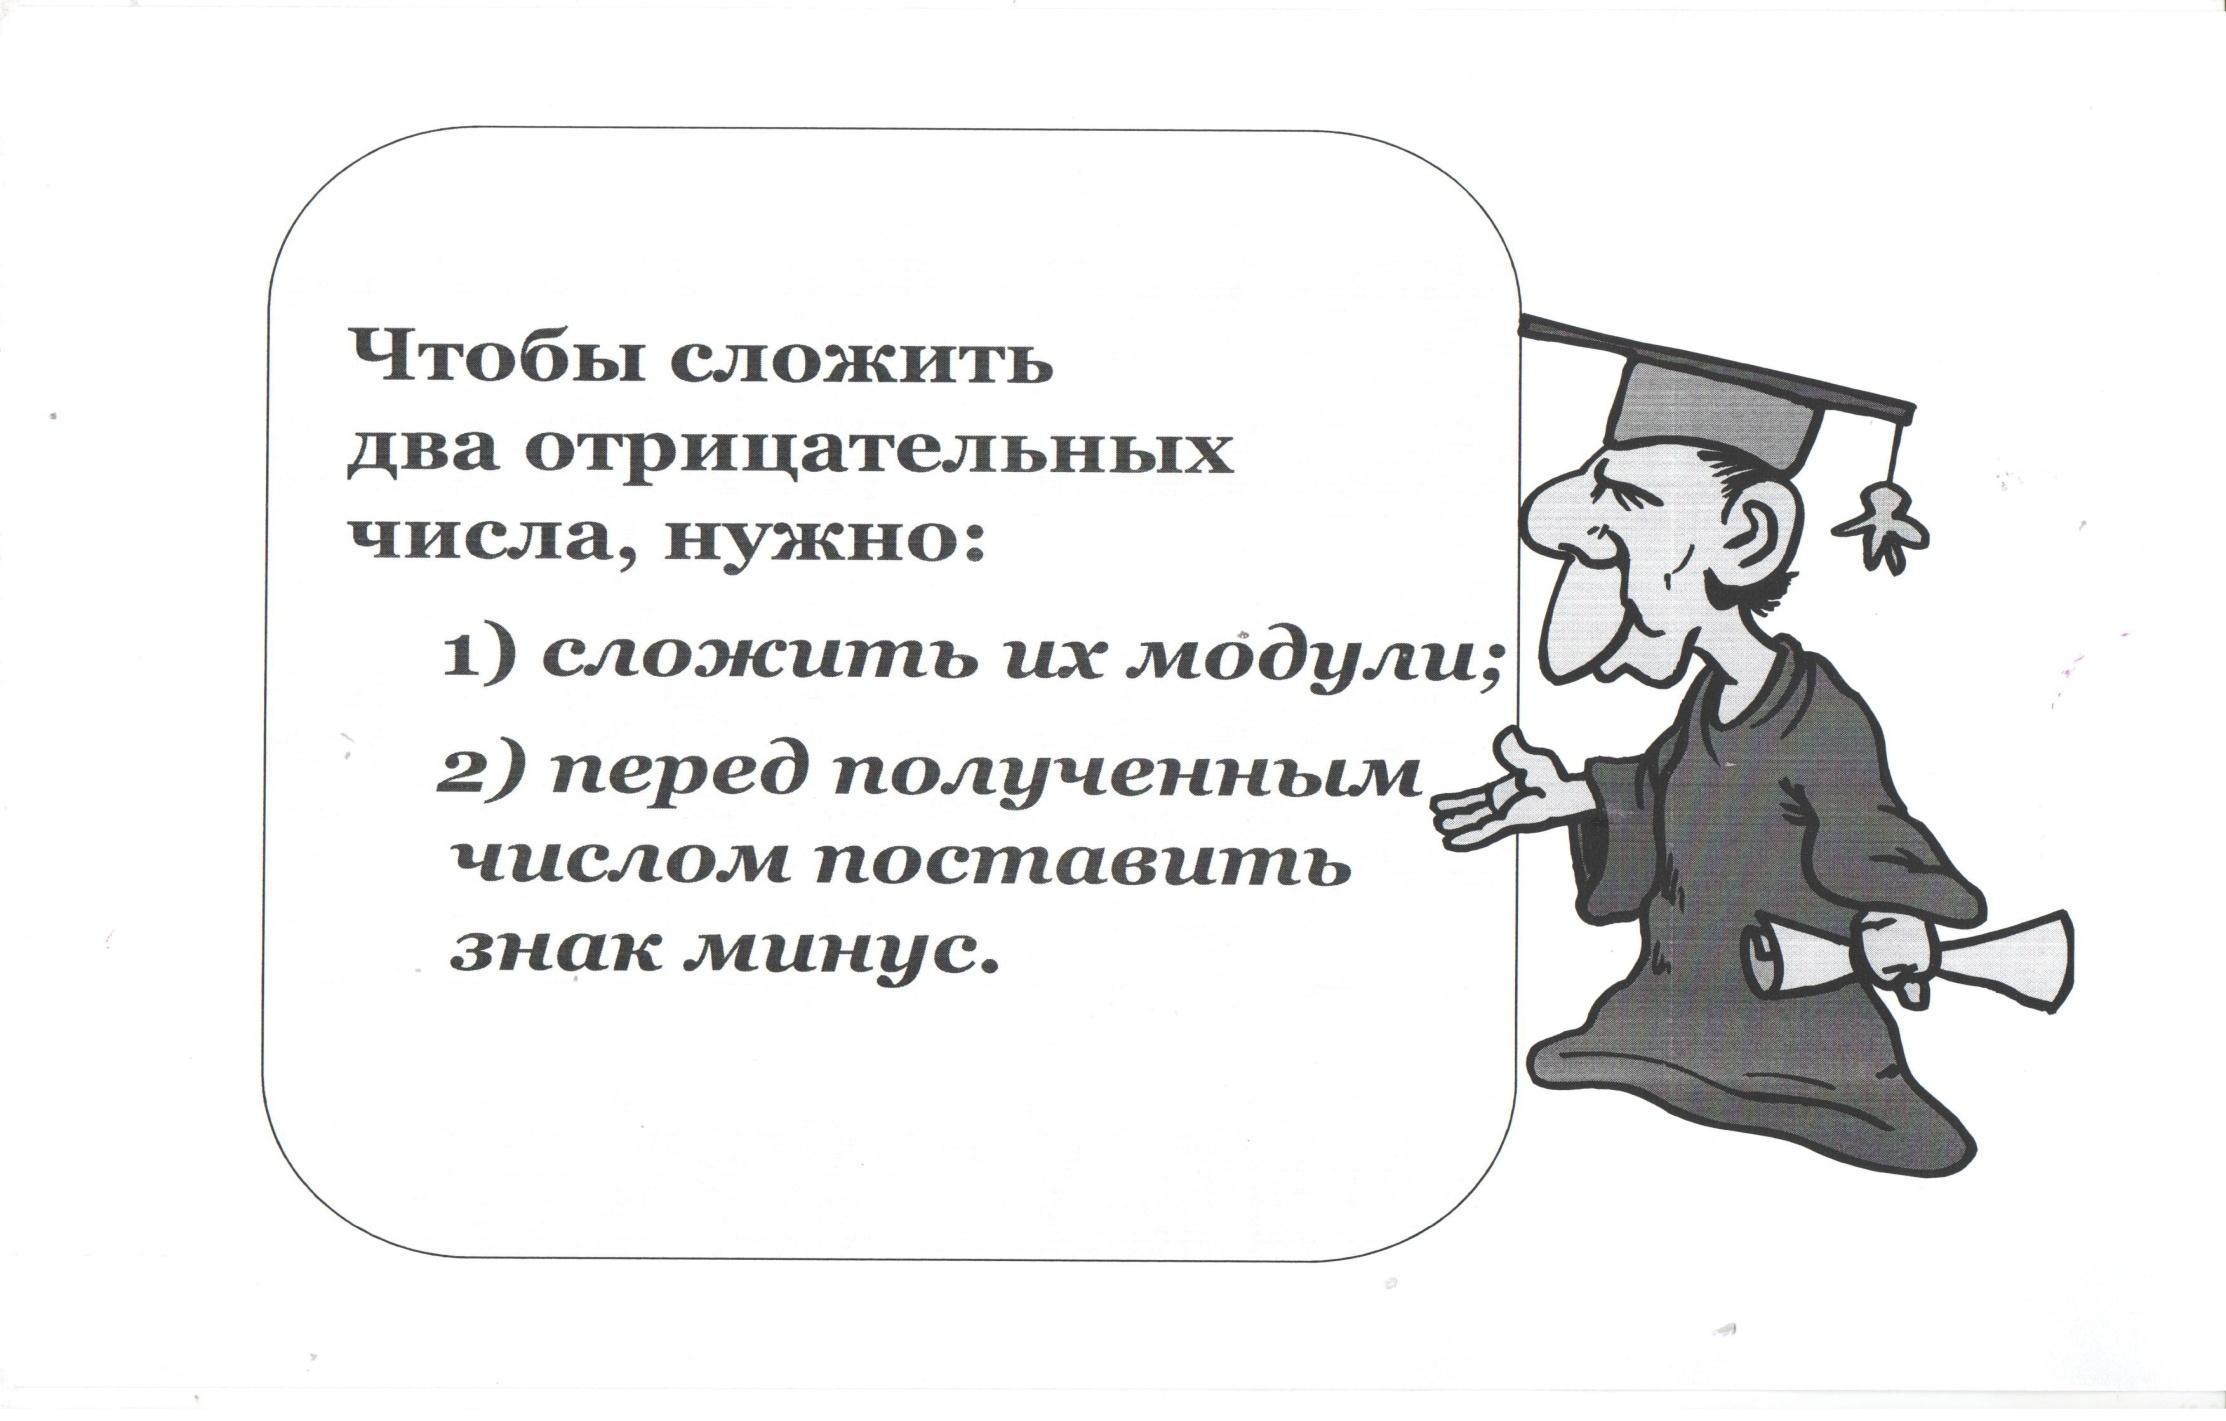 C:\Documents and Settings\Школа\Мои документы\Мои рисунки\Изображение\Изображение 044.jpg